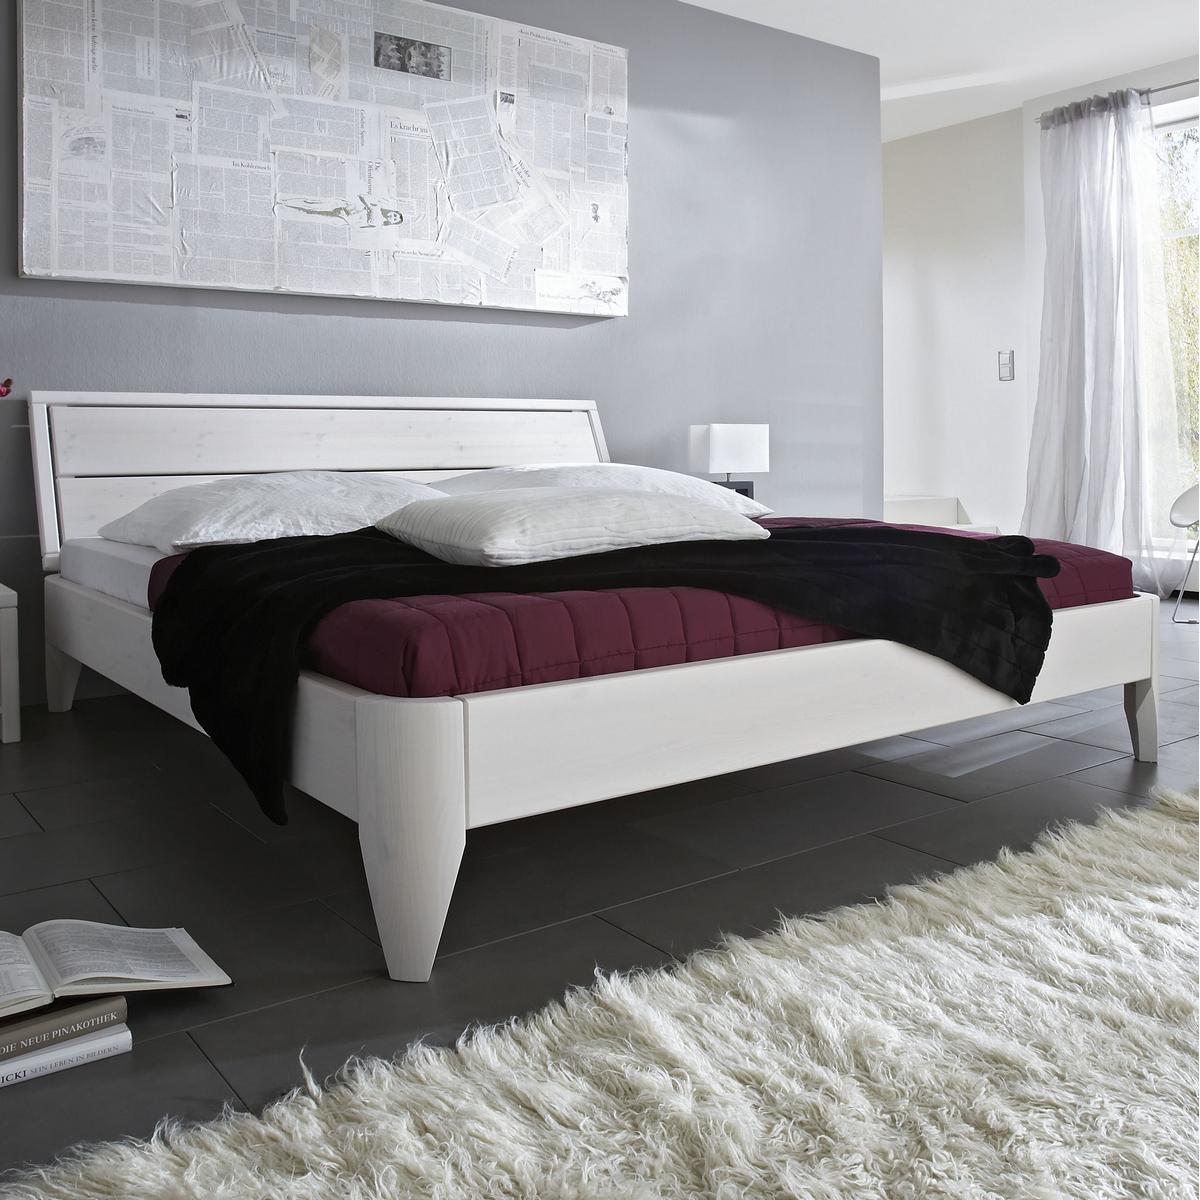 Massivholz Bett 200x200 XL EASY SLEEP Kiefer massiv weiß lackiert ...